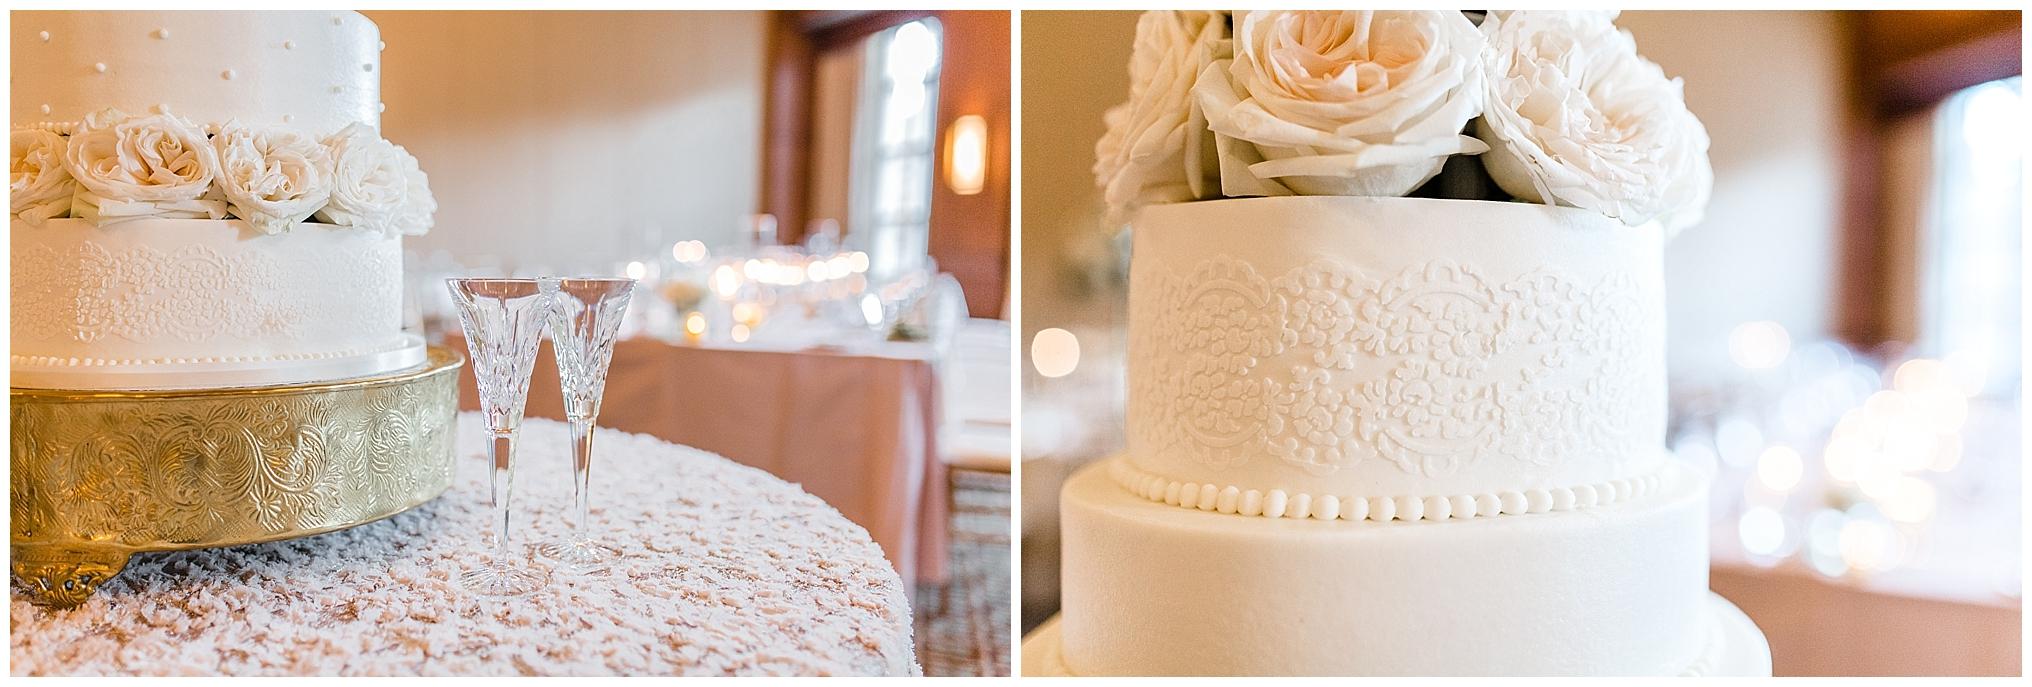 Chapel-Hill-Wedding-Photographer-27.jpg